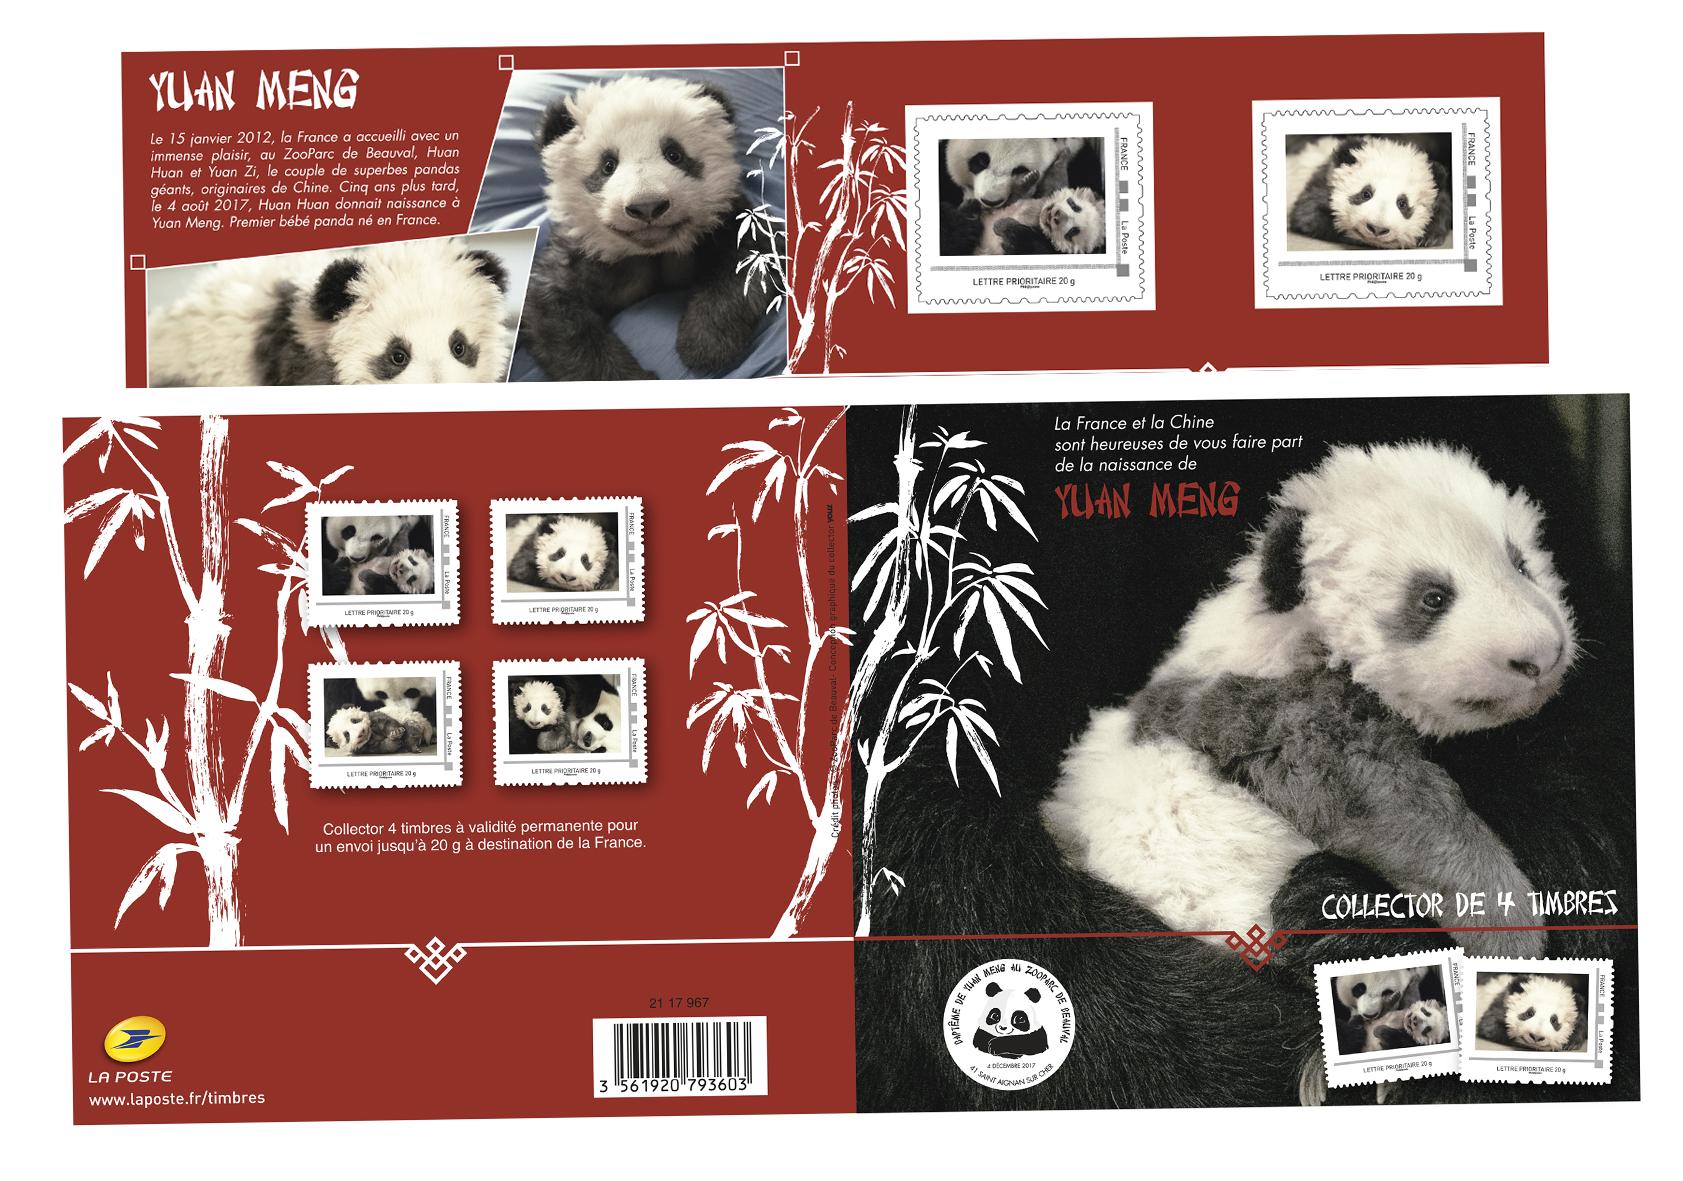 Collector Panda